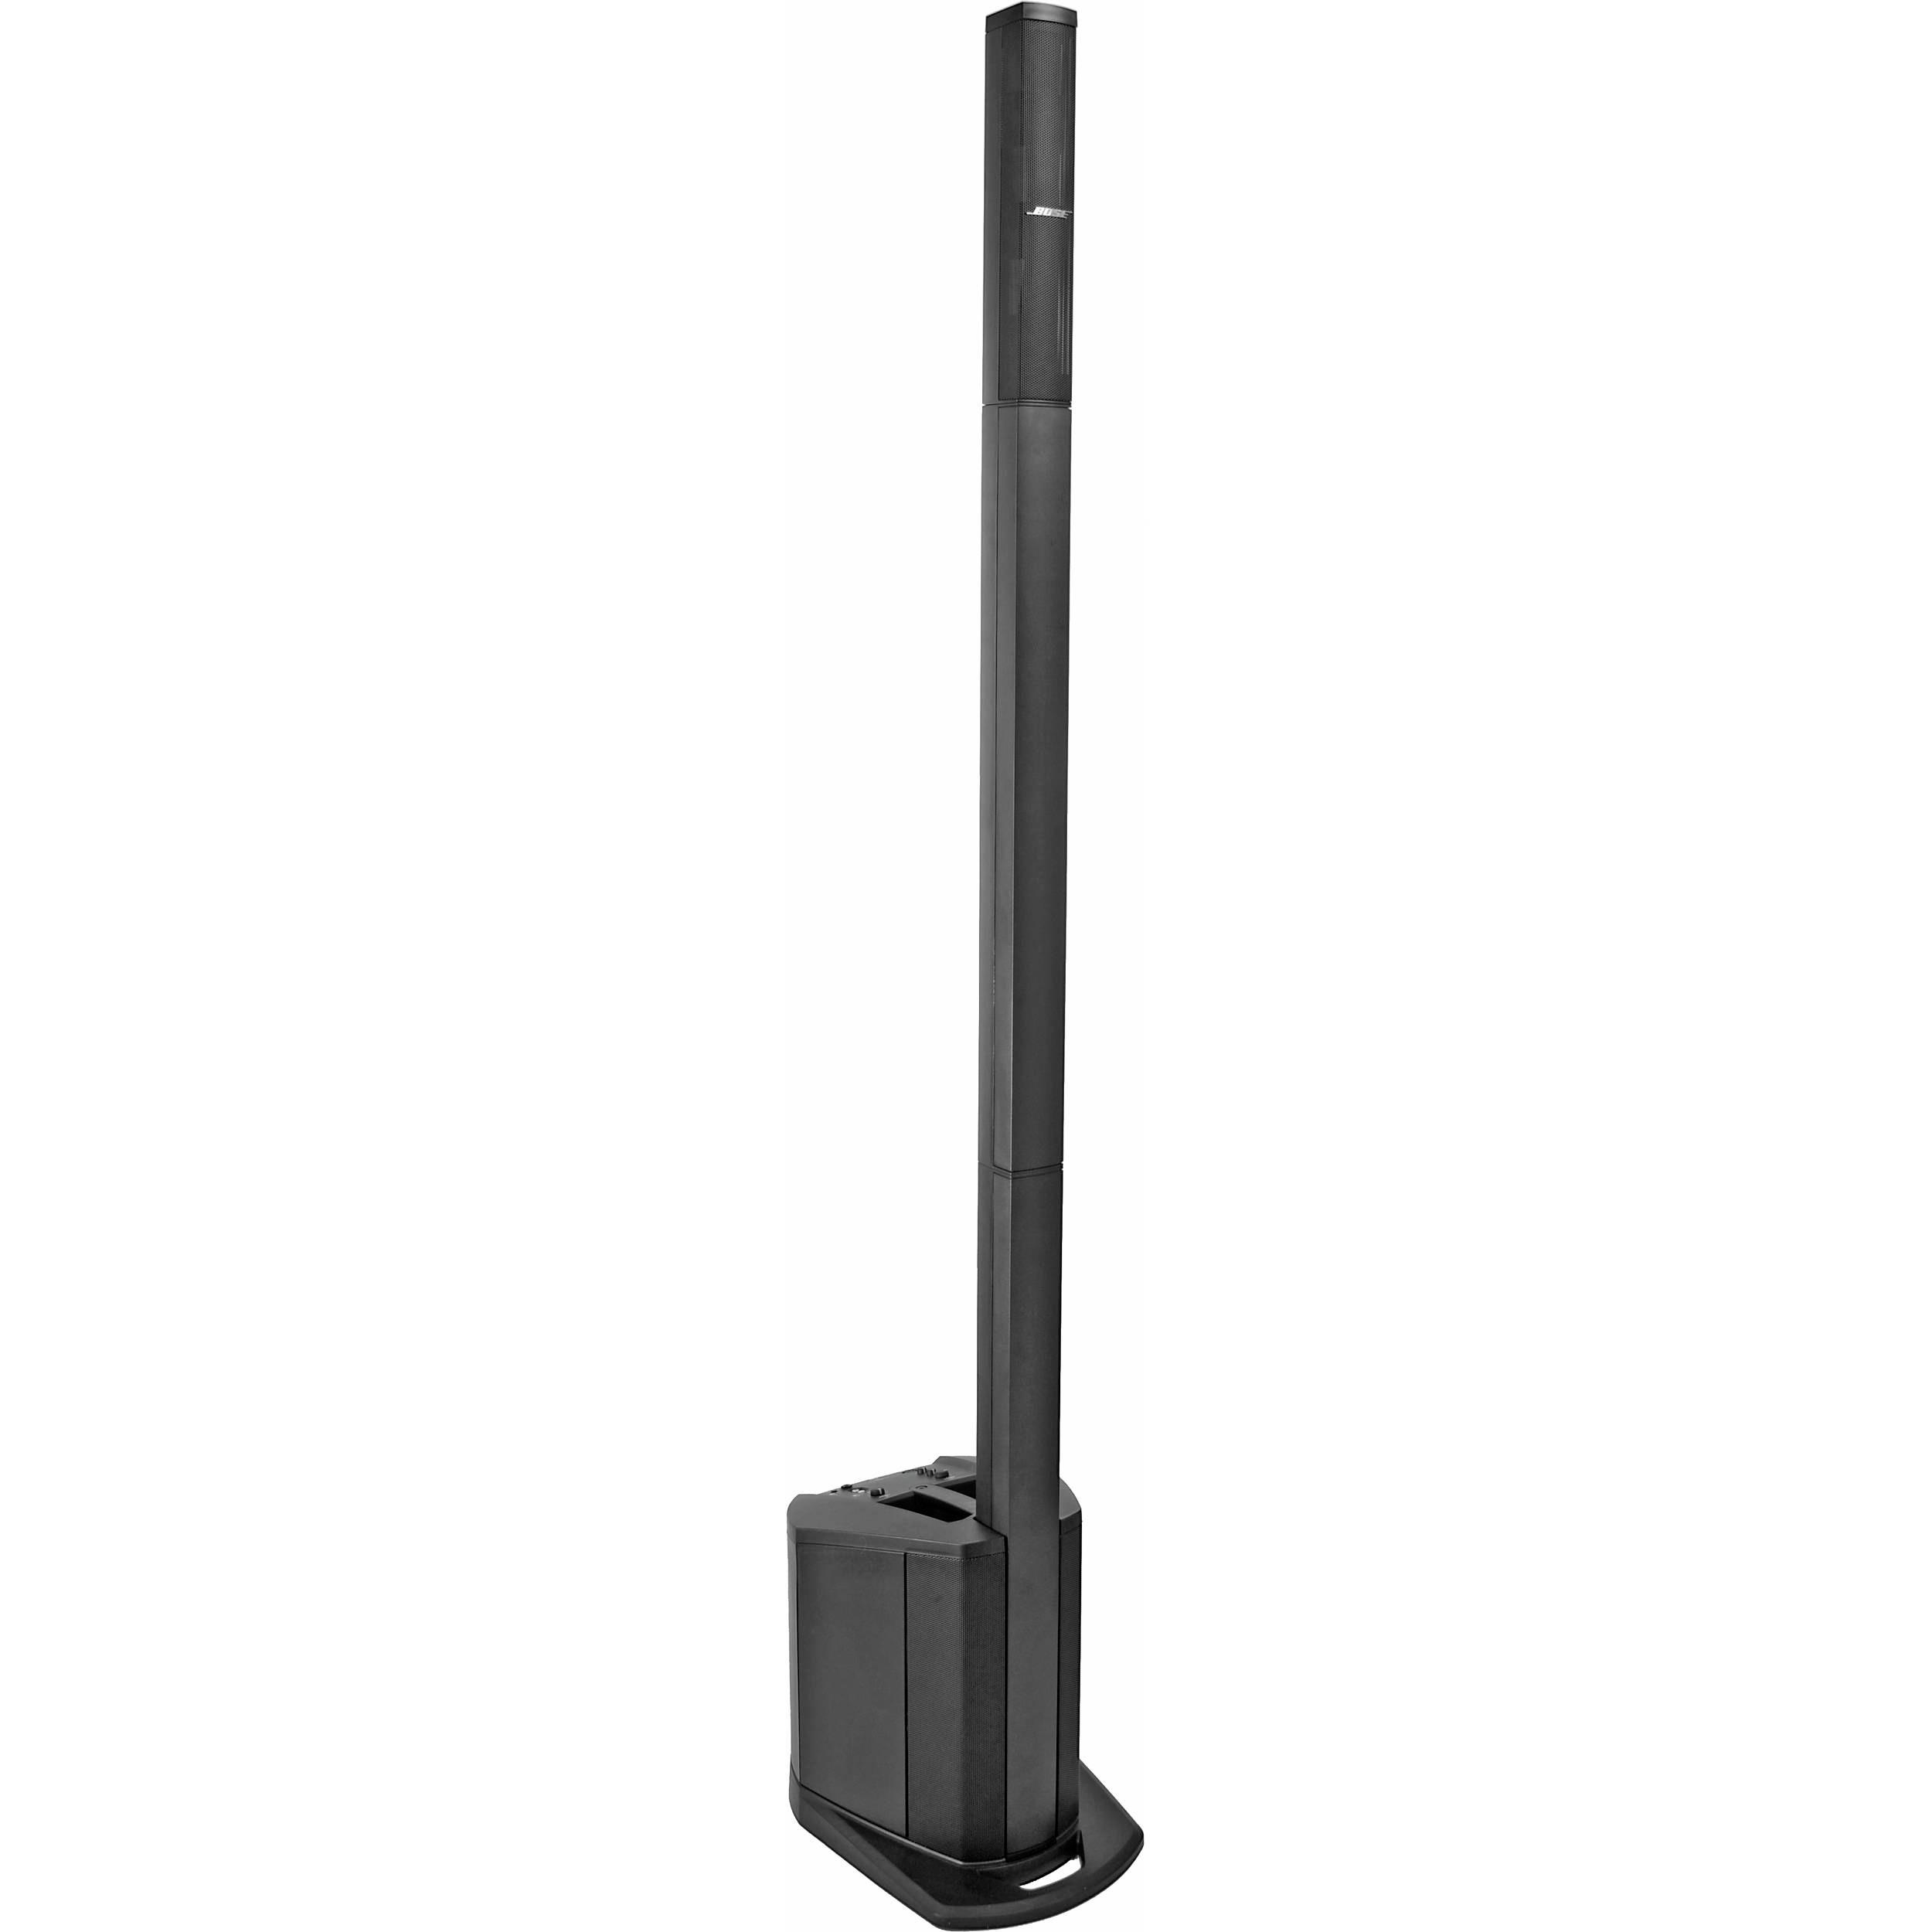 bose l1 compact portable pa array system. Black Bedroom Furniture Sets. Home Design Ideas